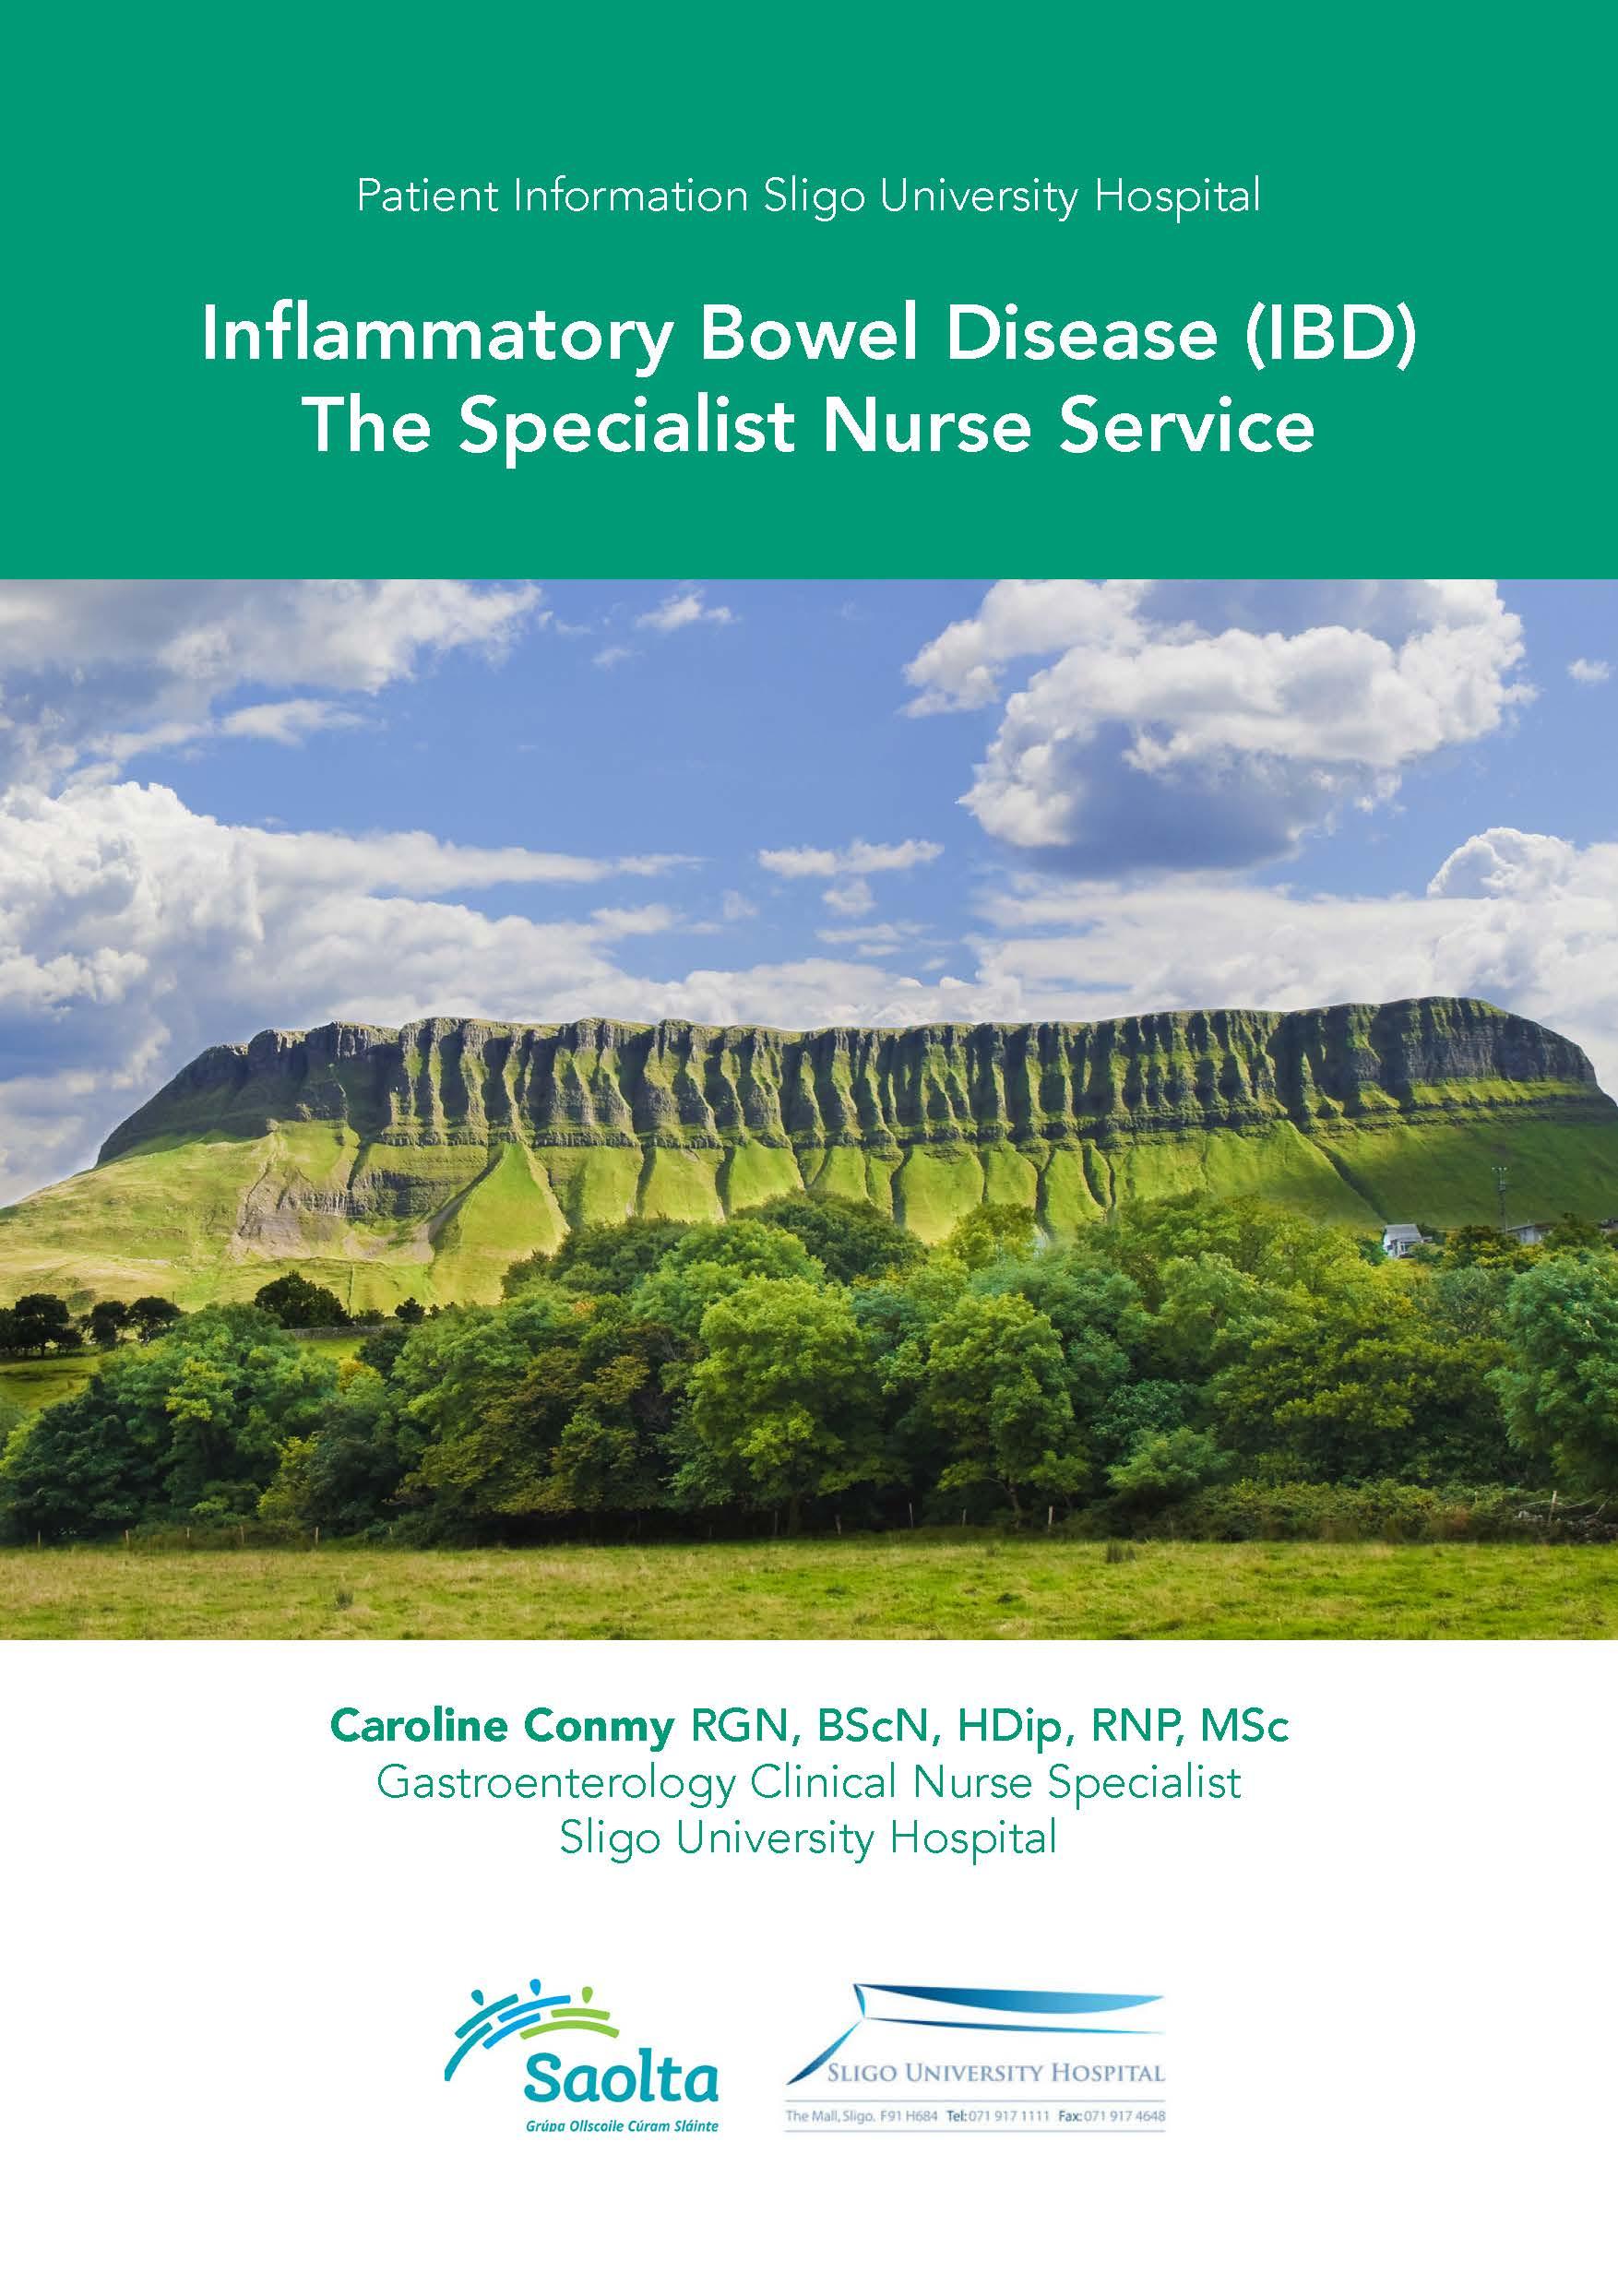 IBD - The Specialist Nurse Service